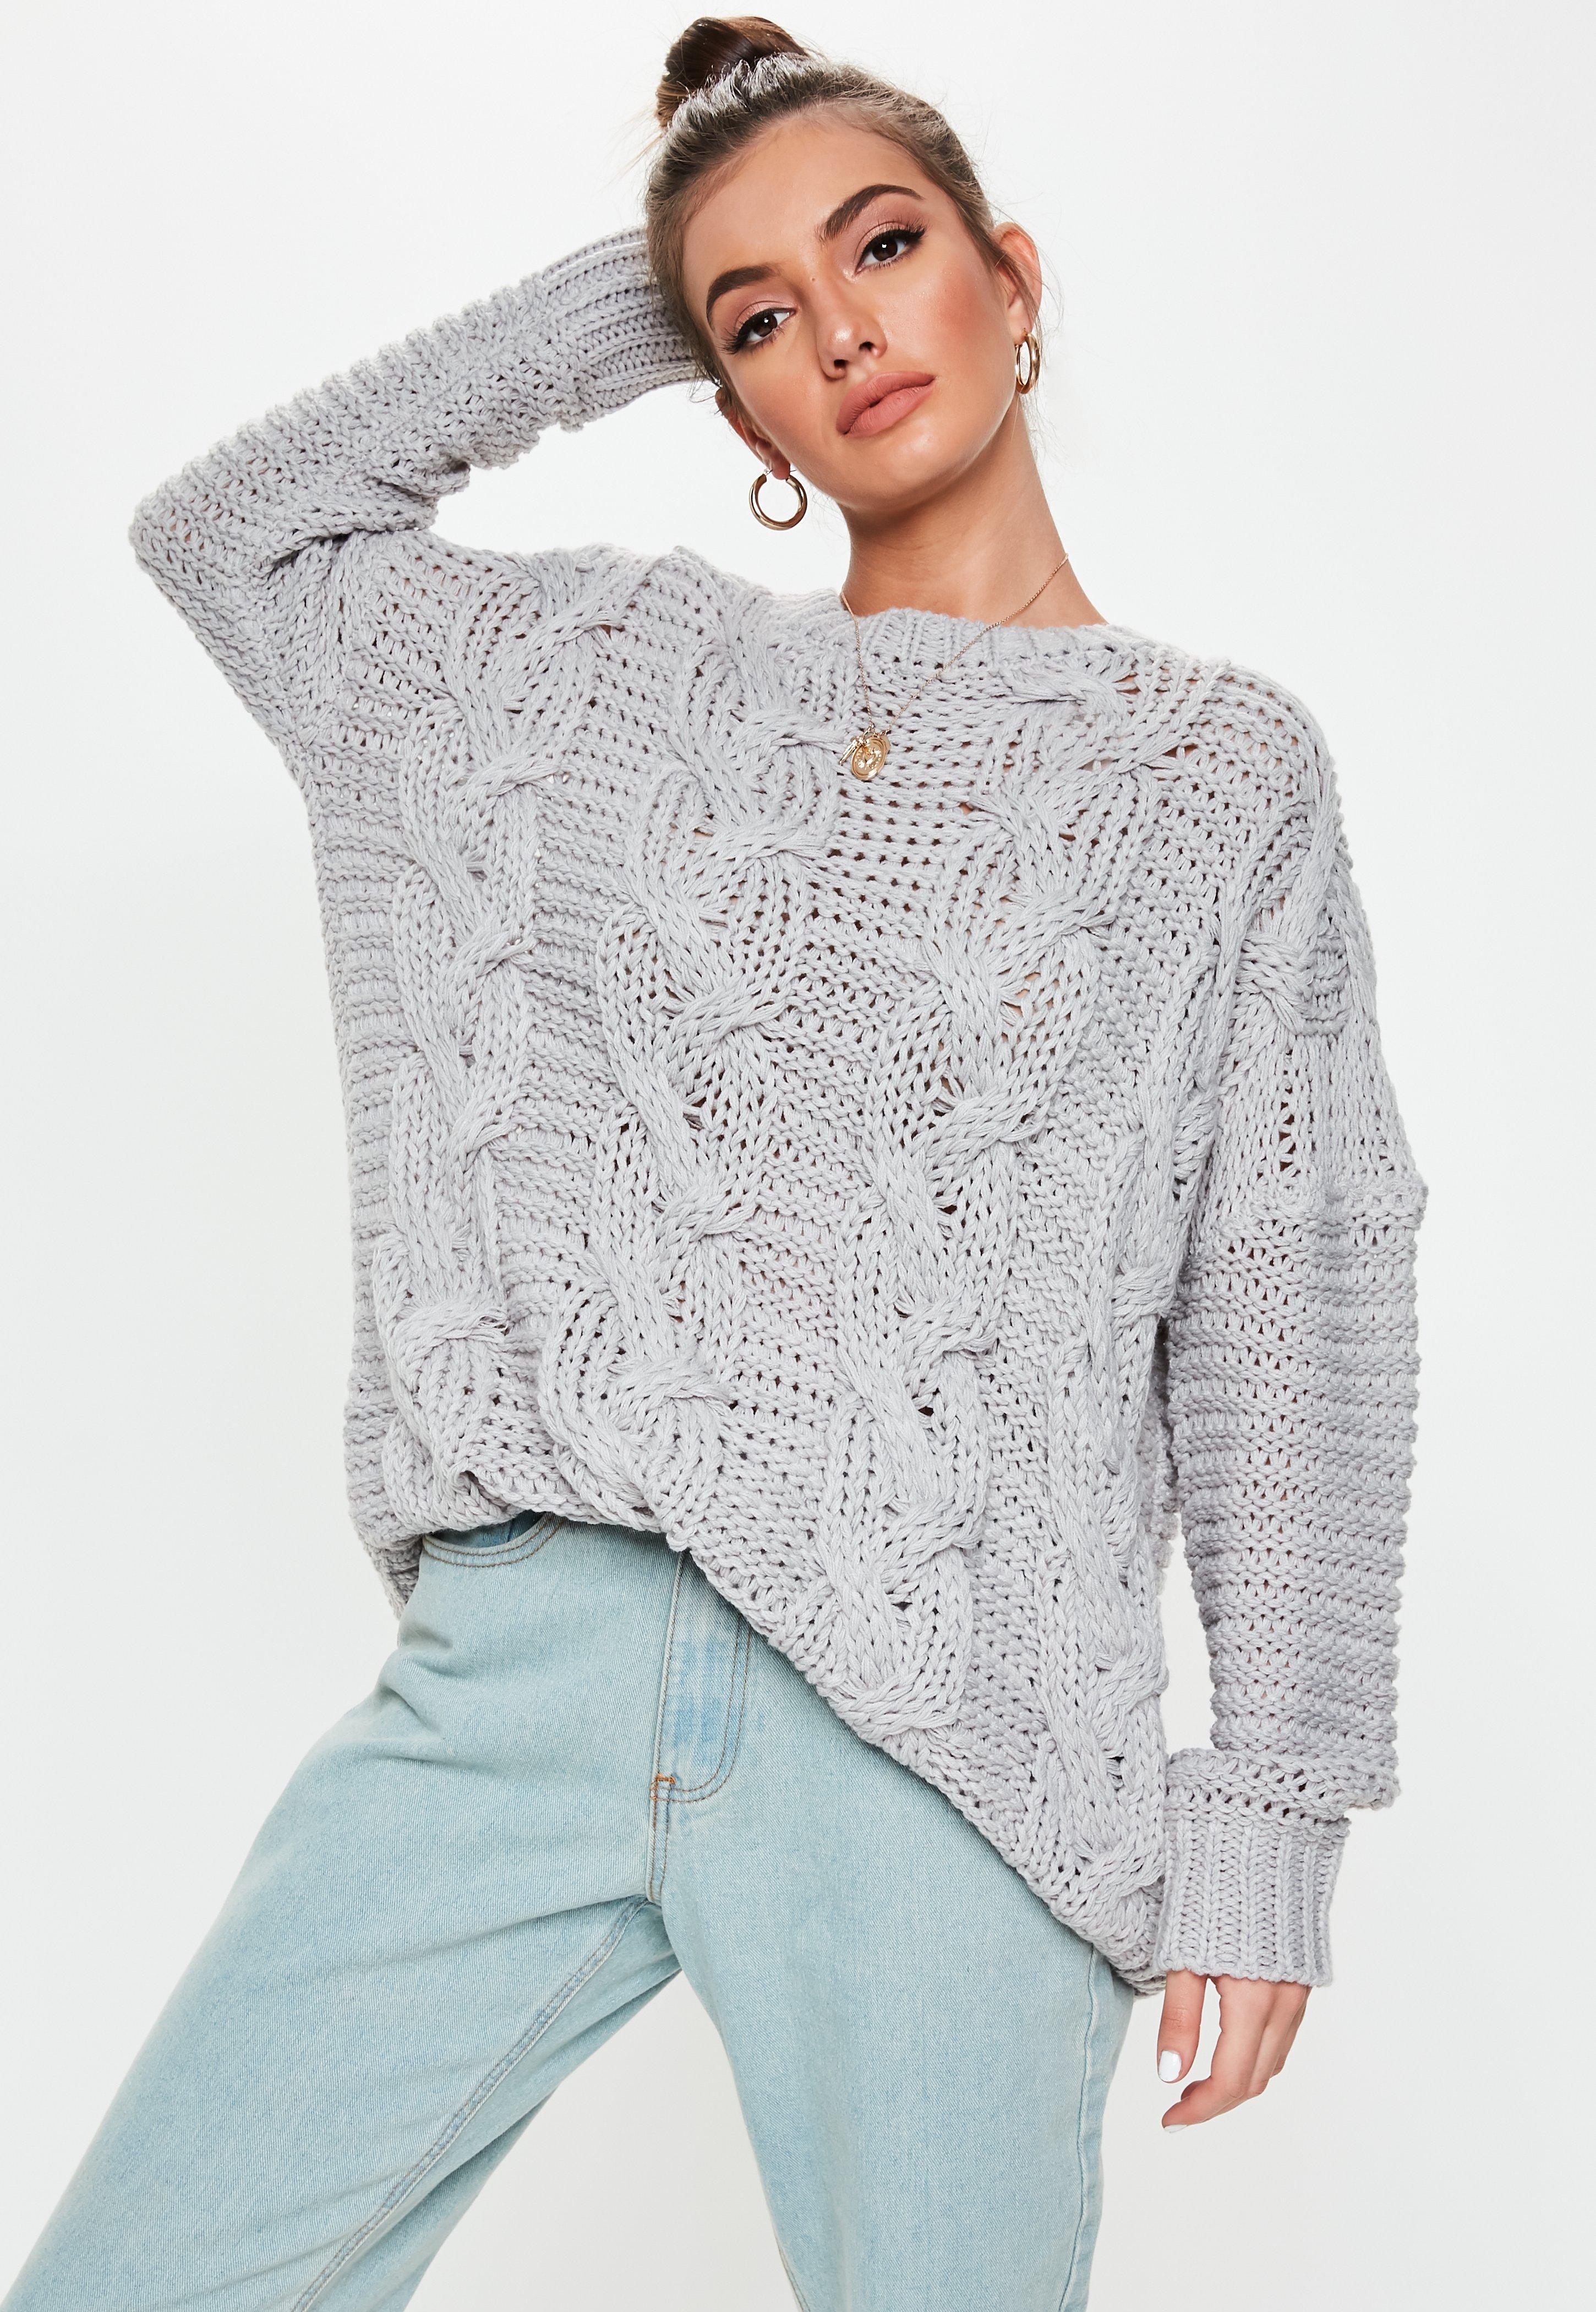 4bd786e05b Women s Sweaters - Oversized   Knitted Sweaters